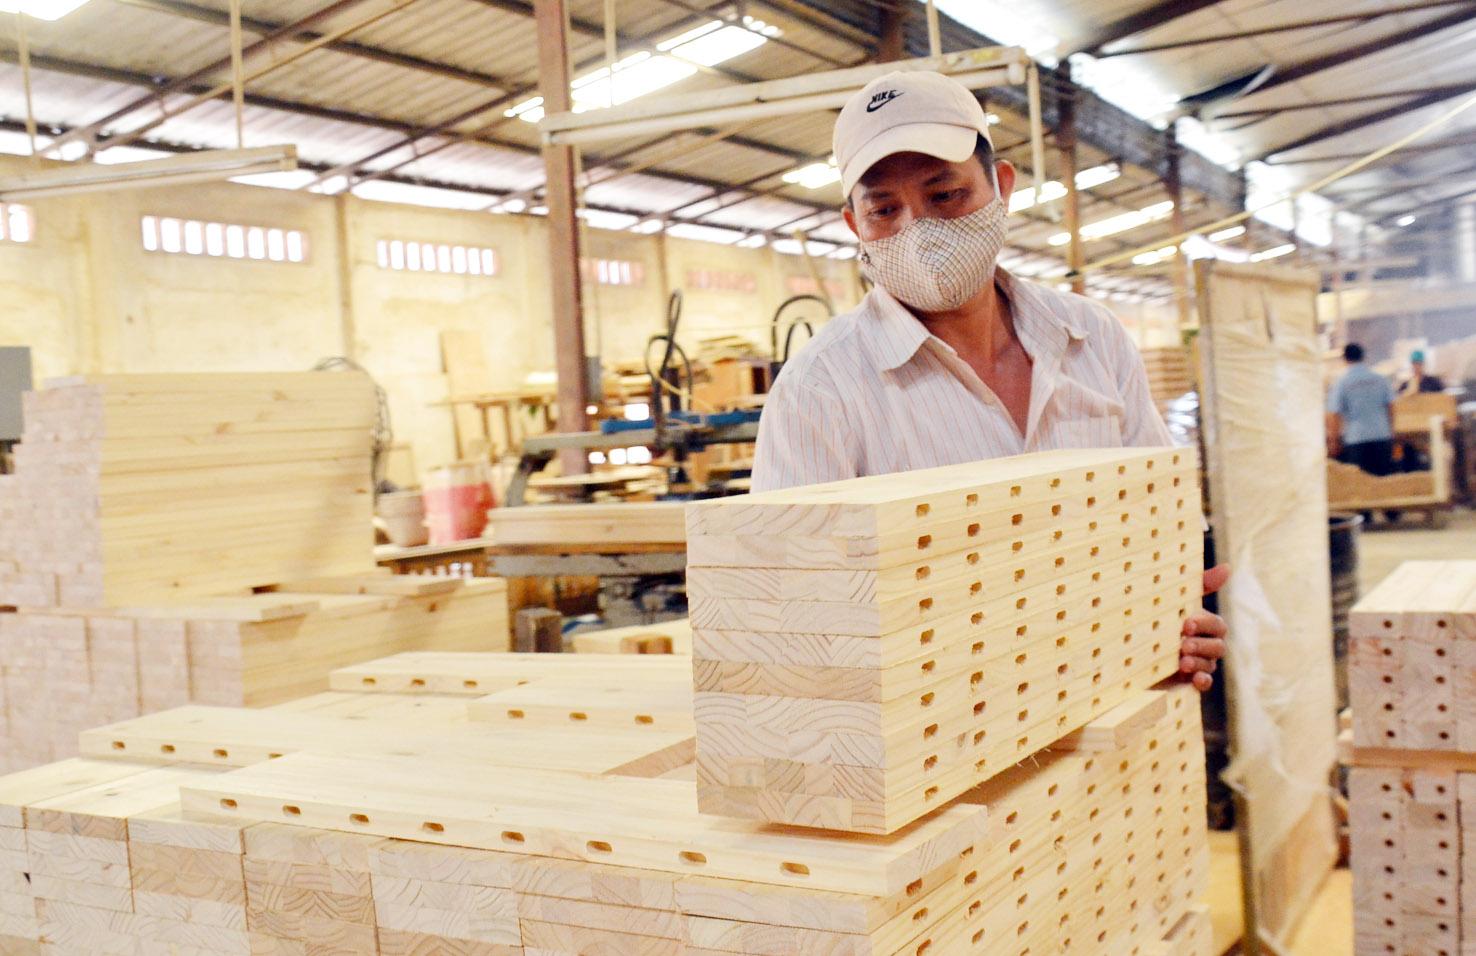 Exportations de bois: un milliard de dollars en janvier